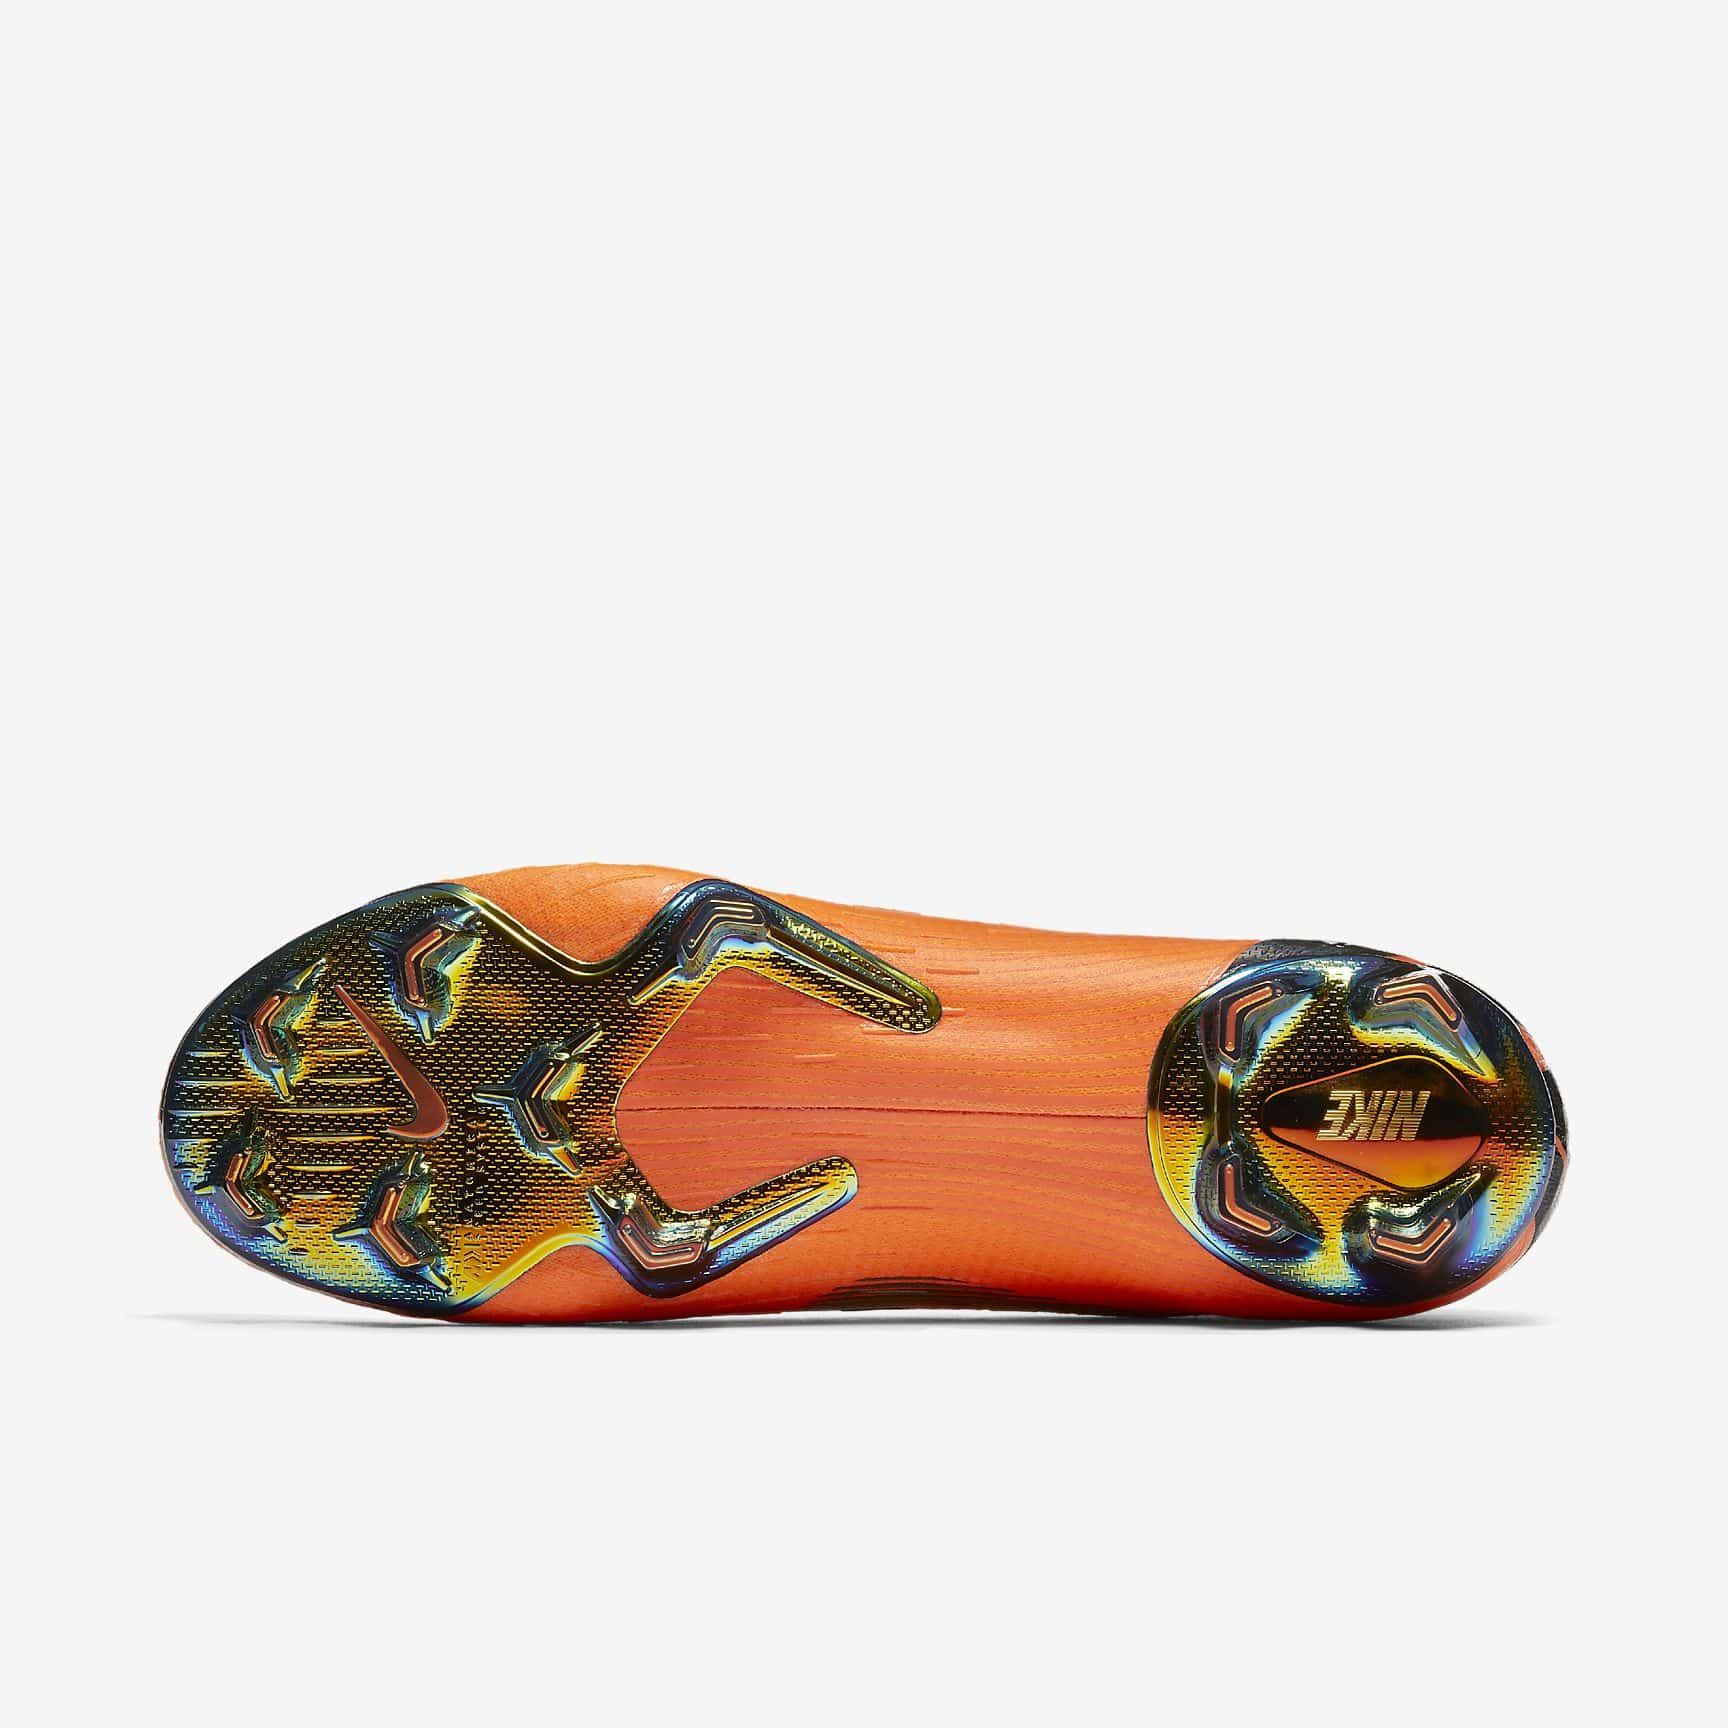 chaussures-football-Nike-Mercurial-Superfly-VI-Elite-img2